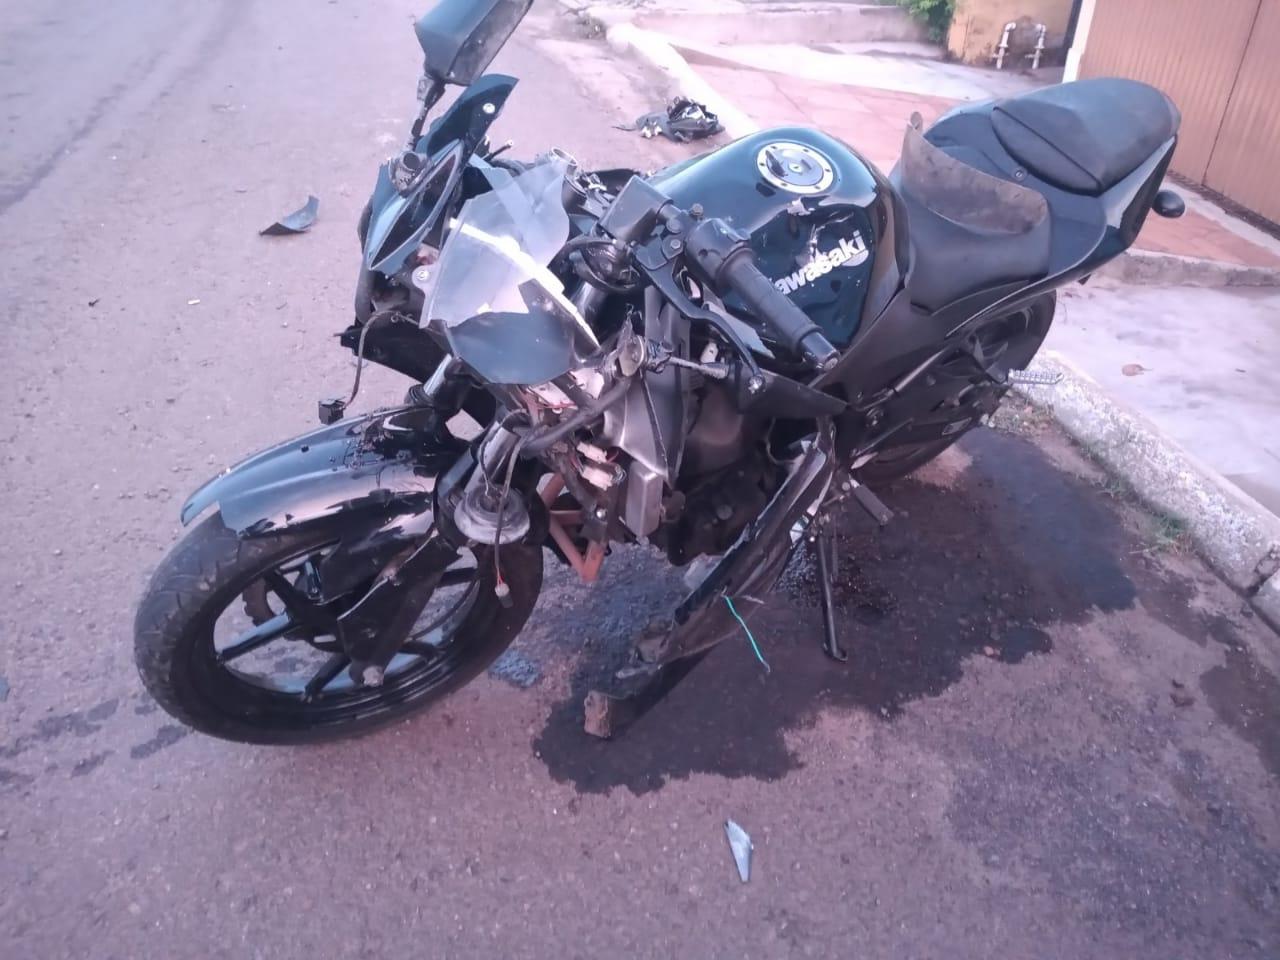 Brita solta provoca acidente entre carro e moto na Avenida Eurípides Brasil Milano